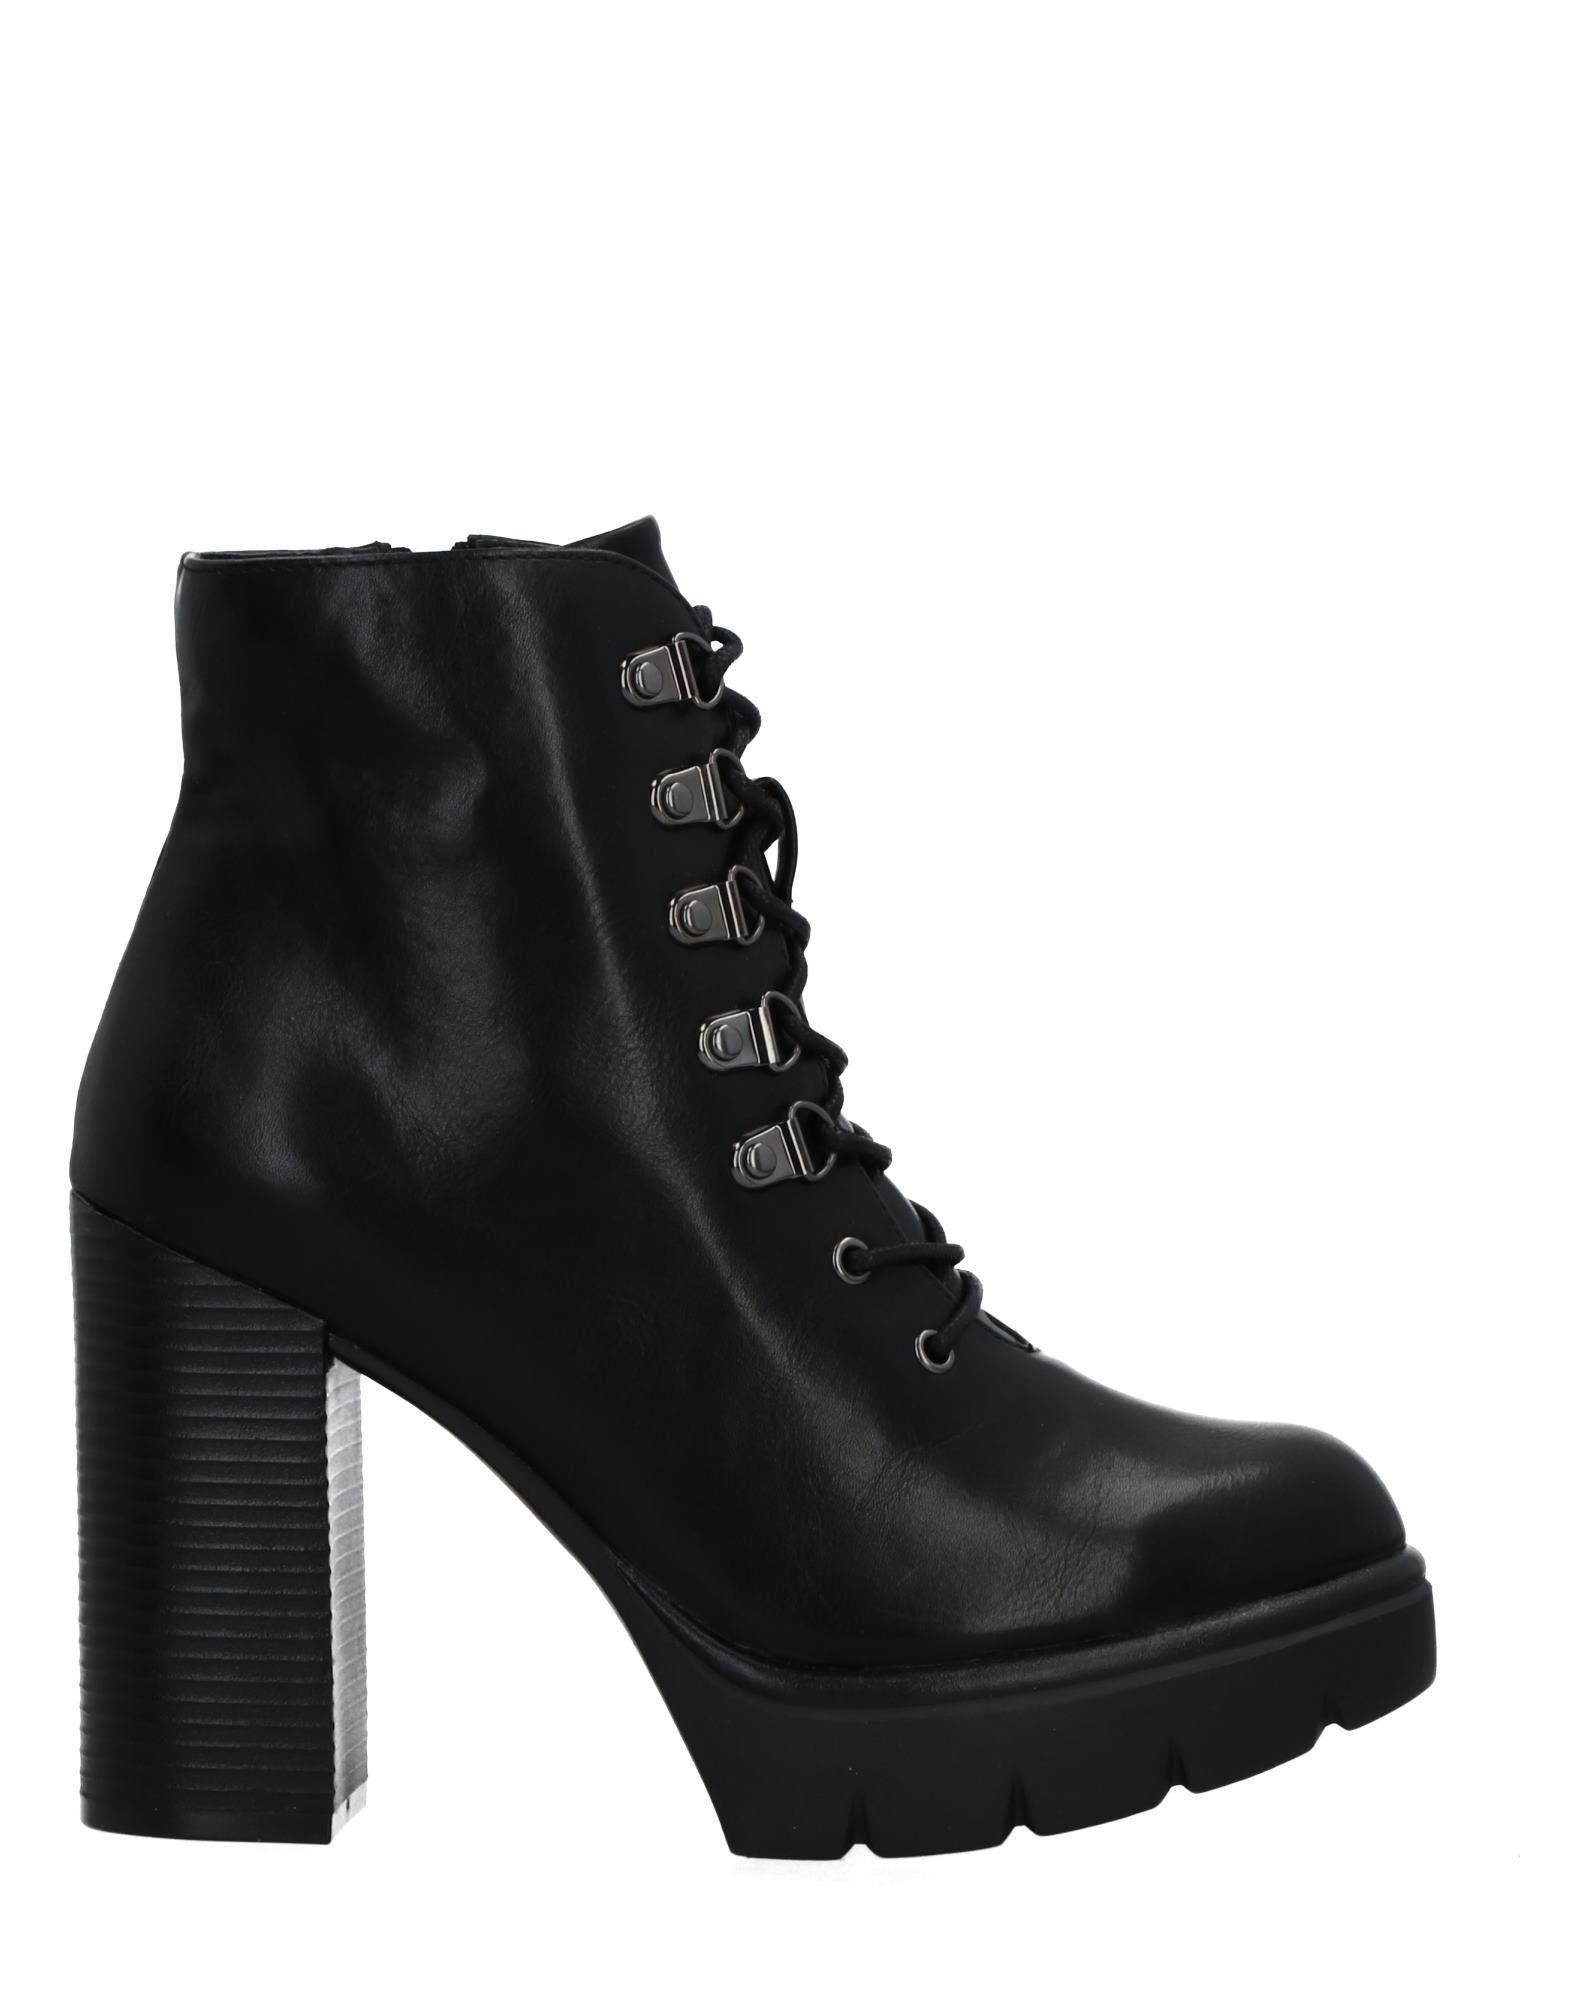 Cafènoir Gute Stiefelette Damen  11515857OJ Gute Cafènoir Qualität beliebte Schuhe 32fadd